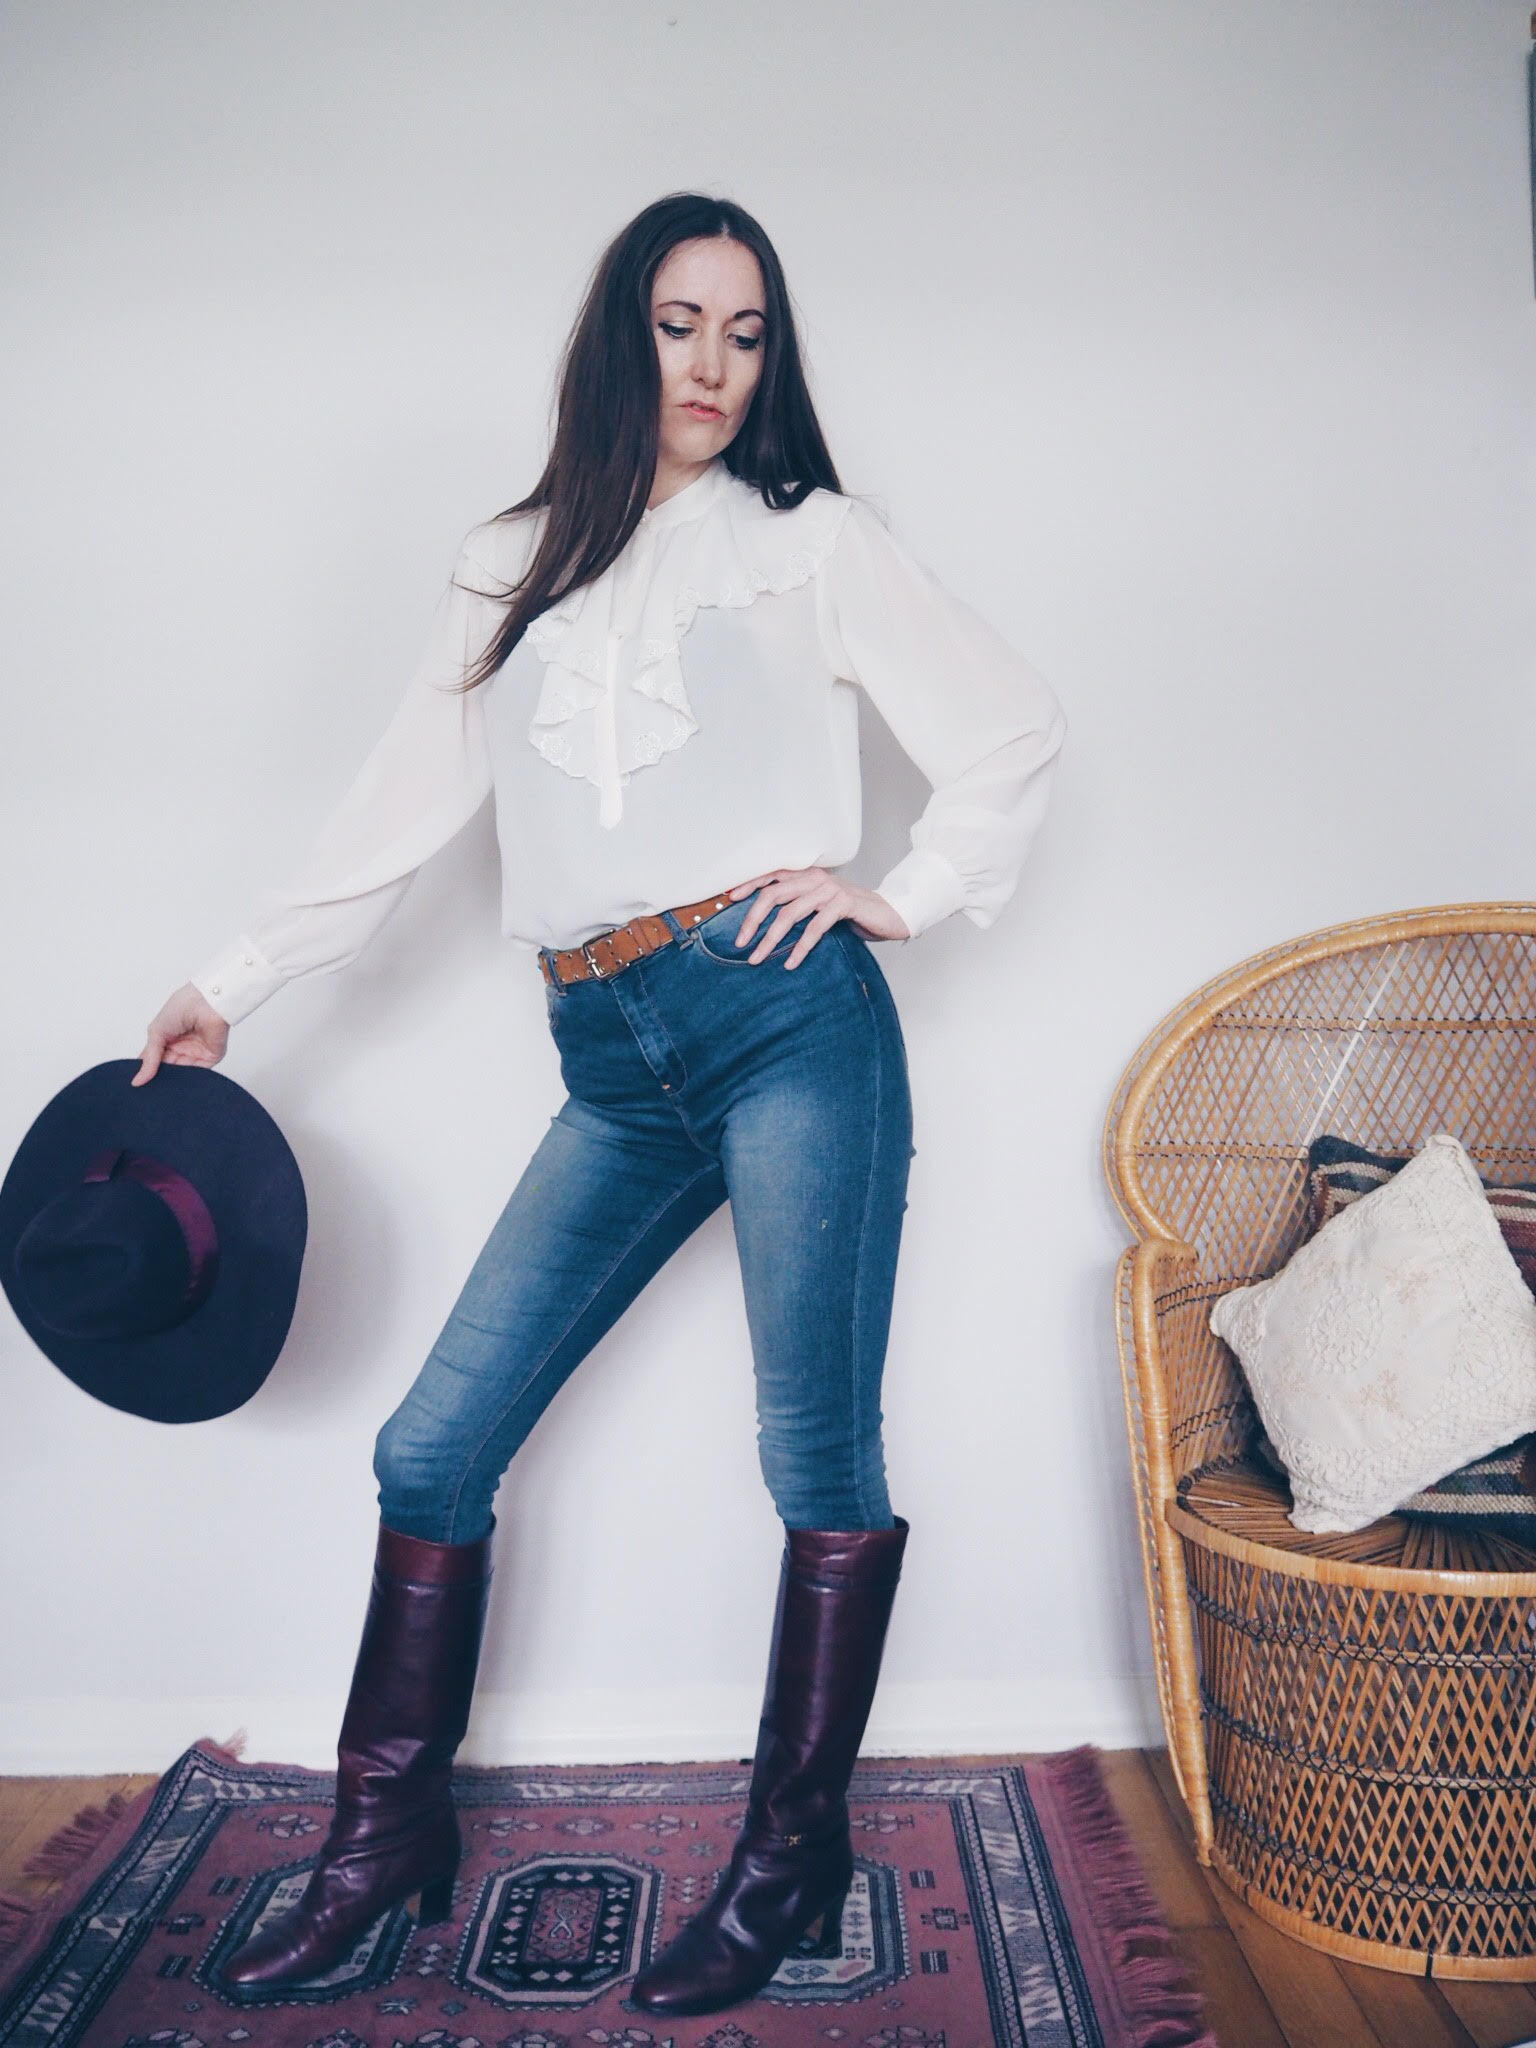 Natalie Wall frill shirt vintage fashion Le Blow